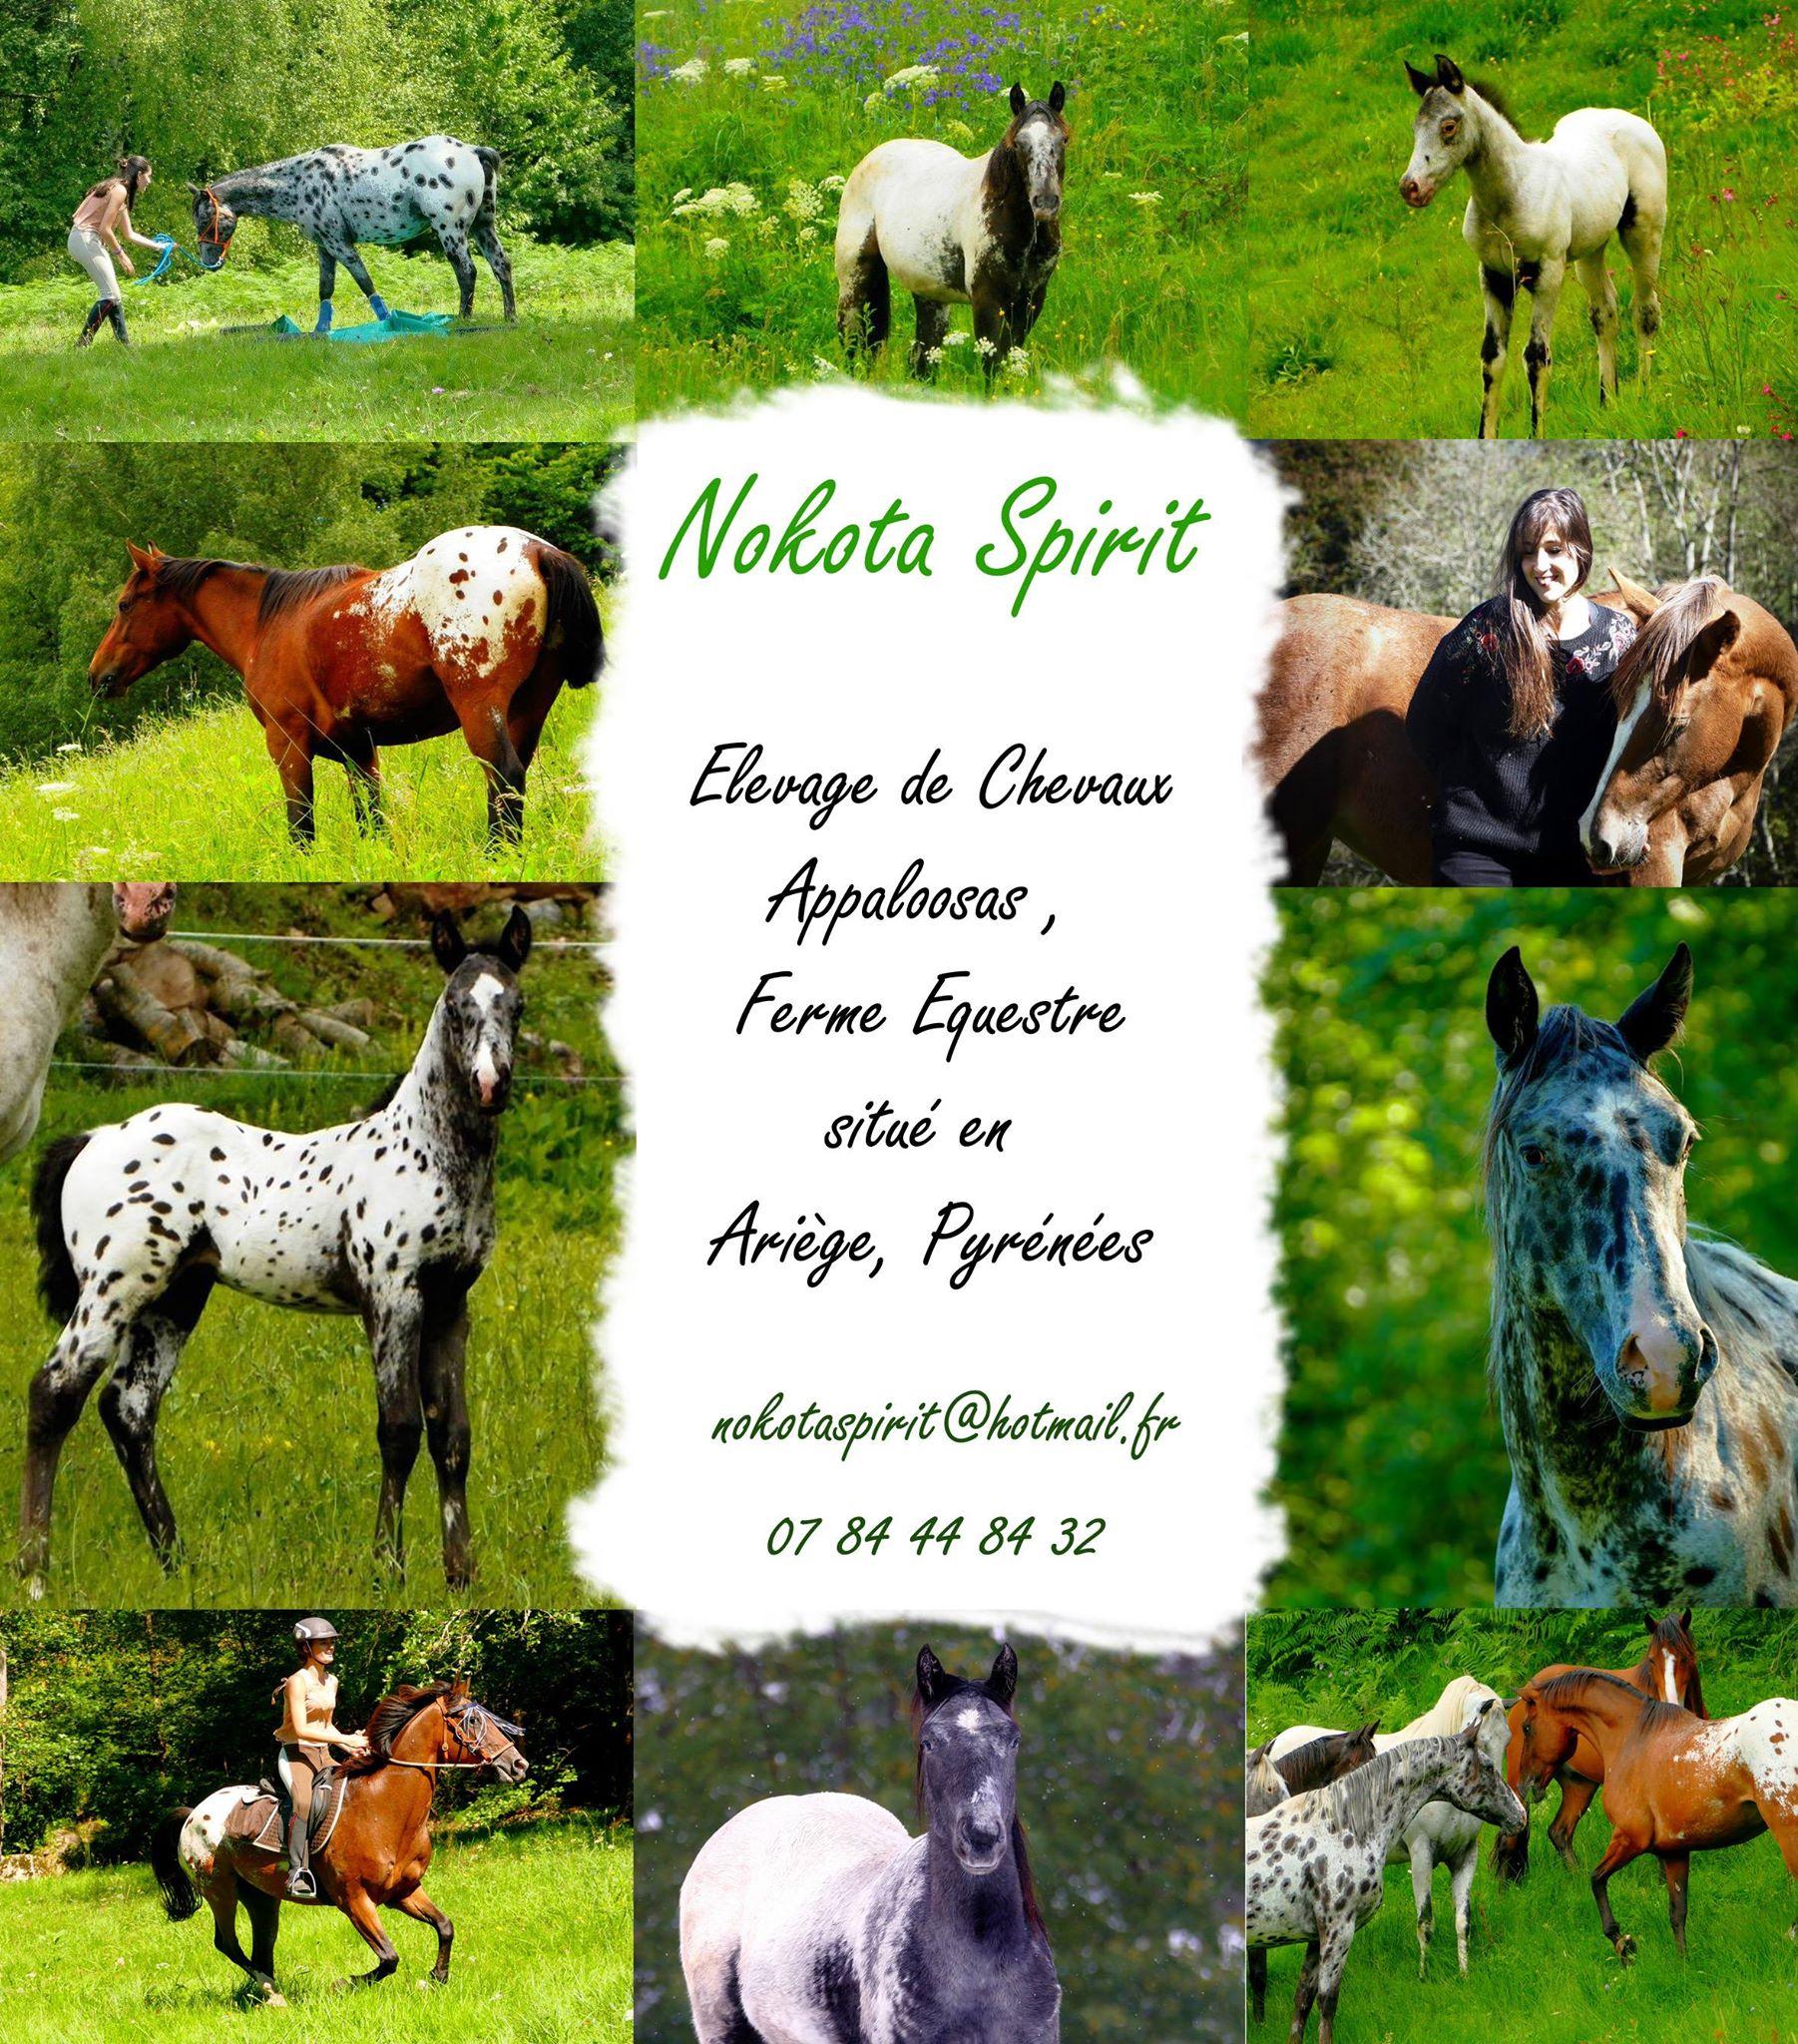 Nokota Spirit